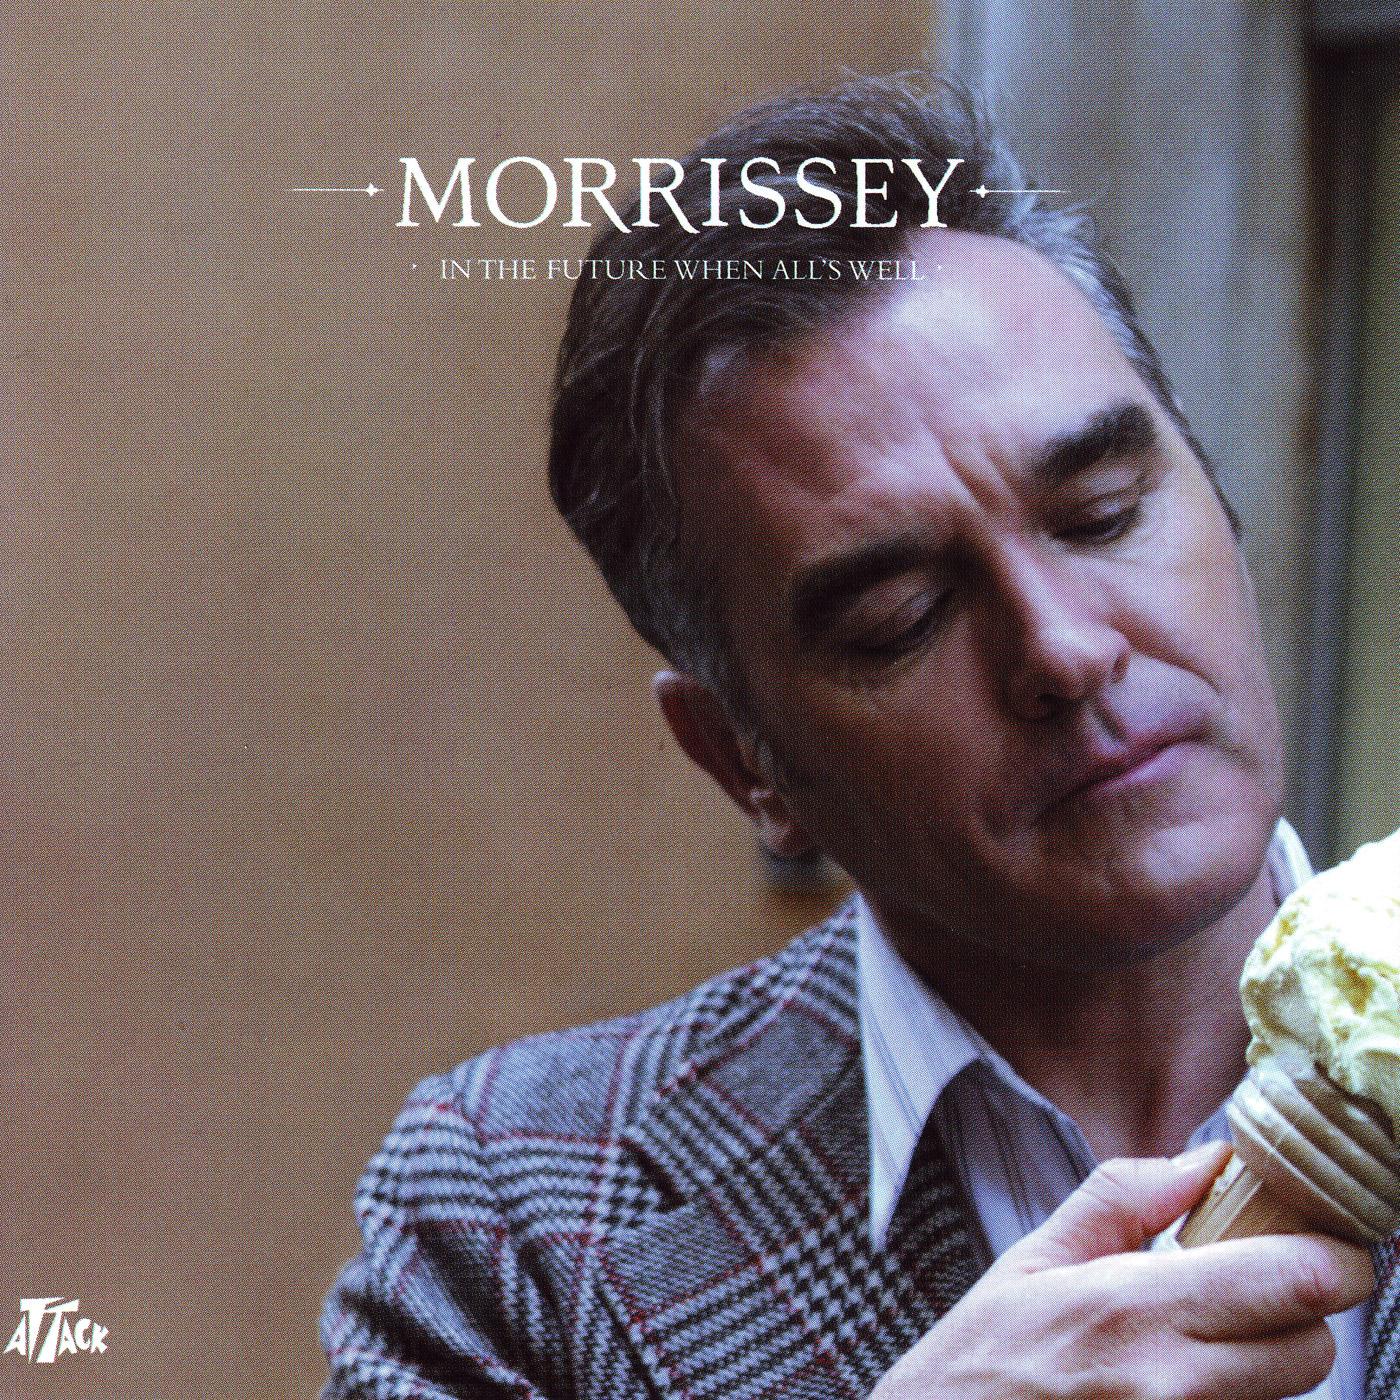 Morrissey Fabio Lovino Gelato (i).jpg